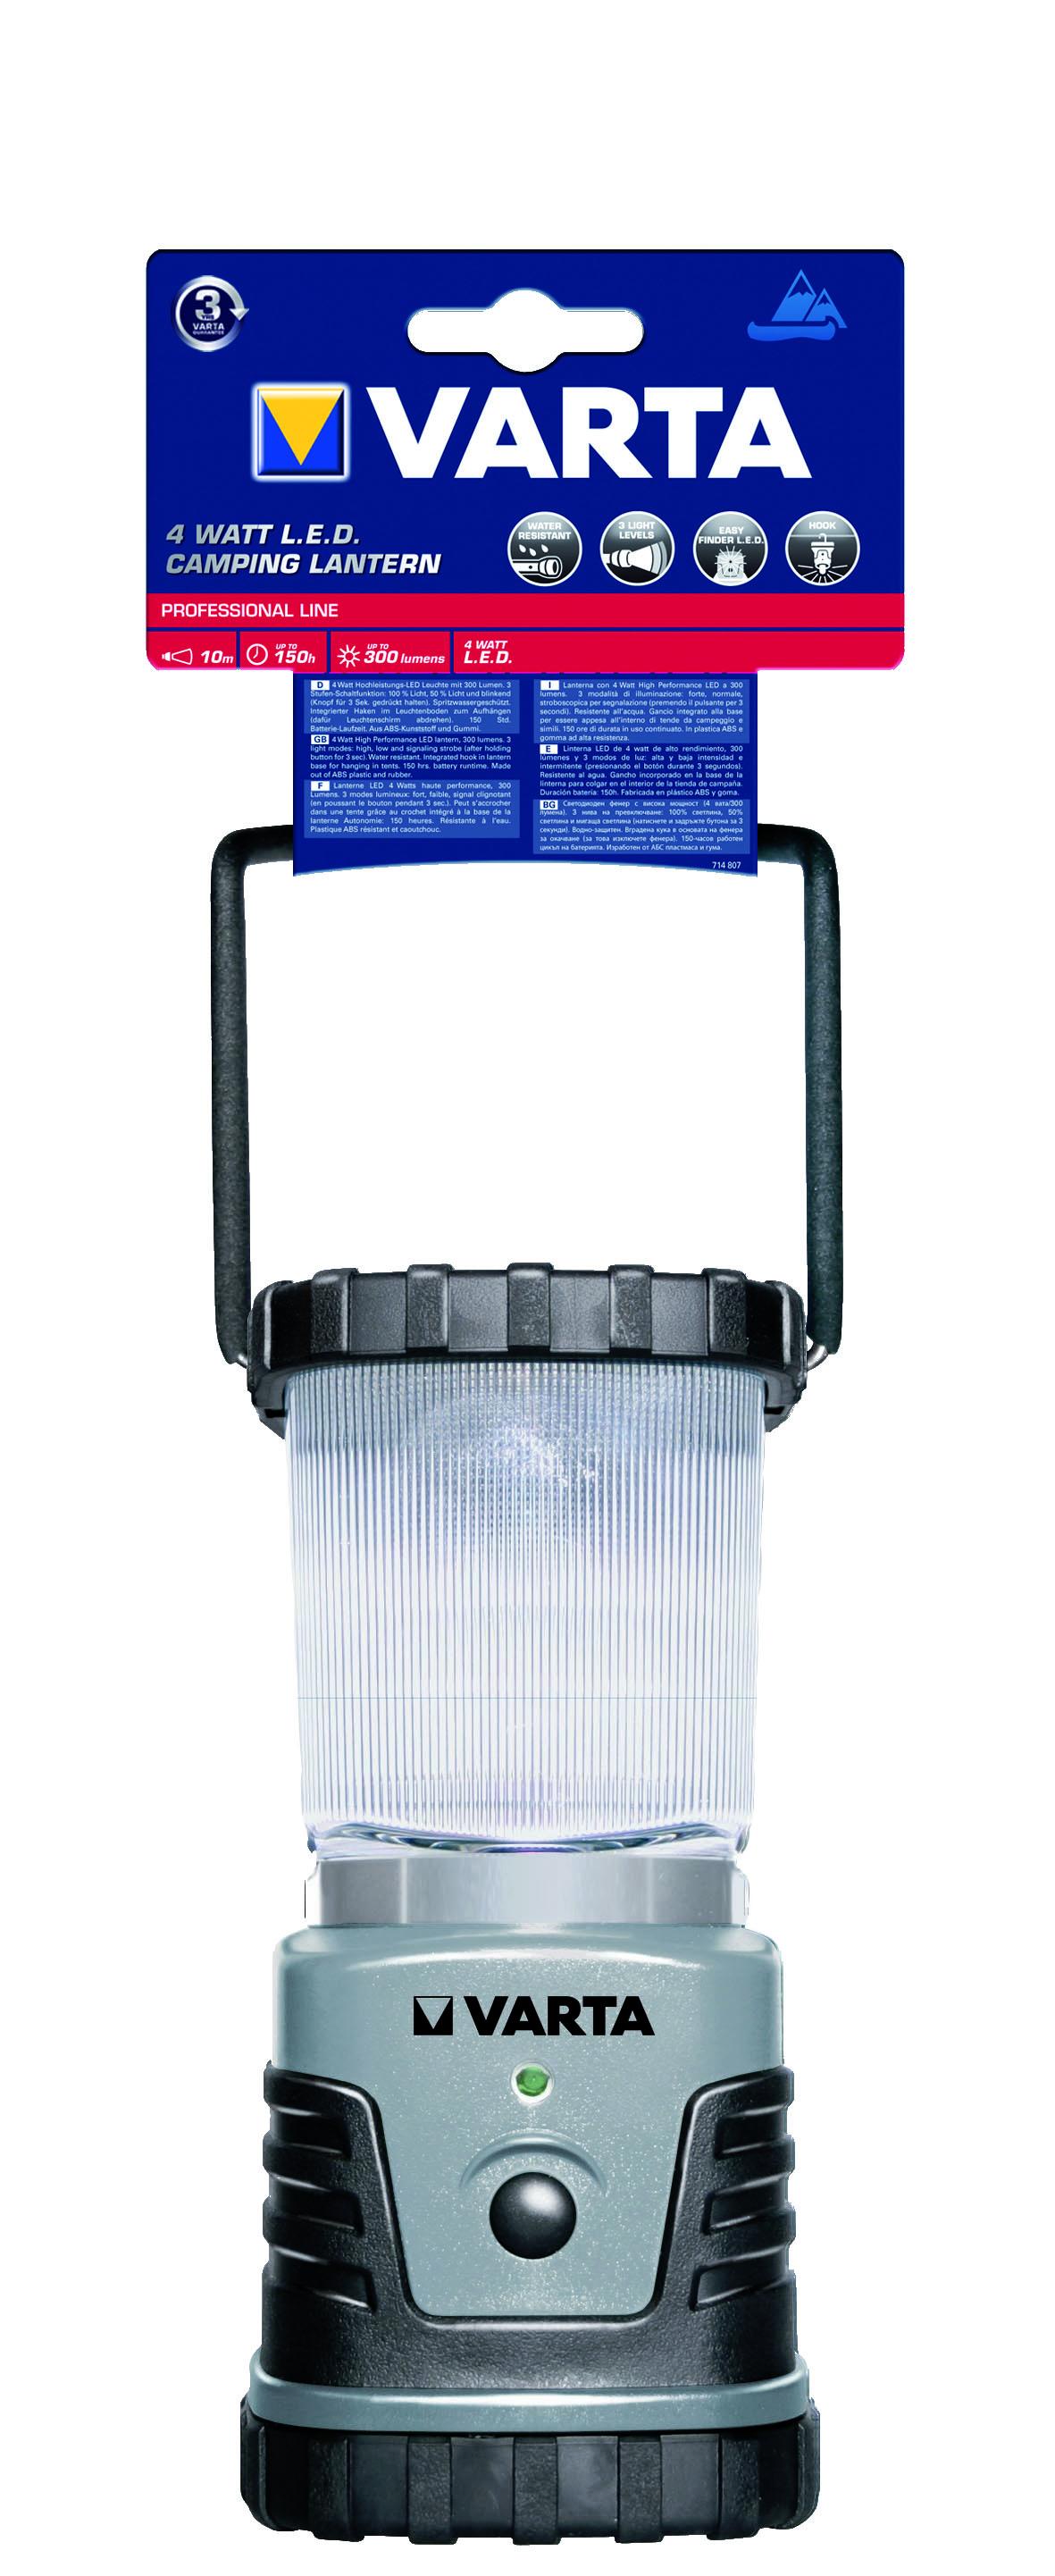 VARTA Elemlámpa - 4W LED CAMPING LANTERN